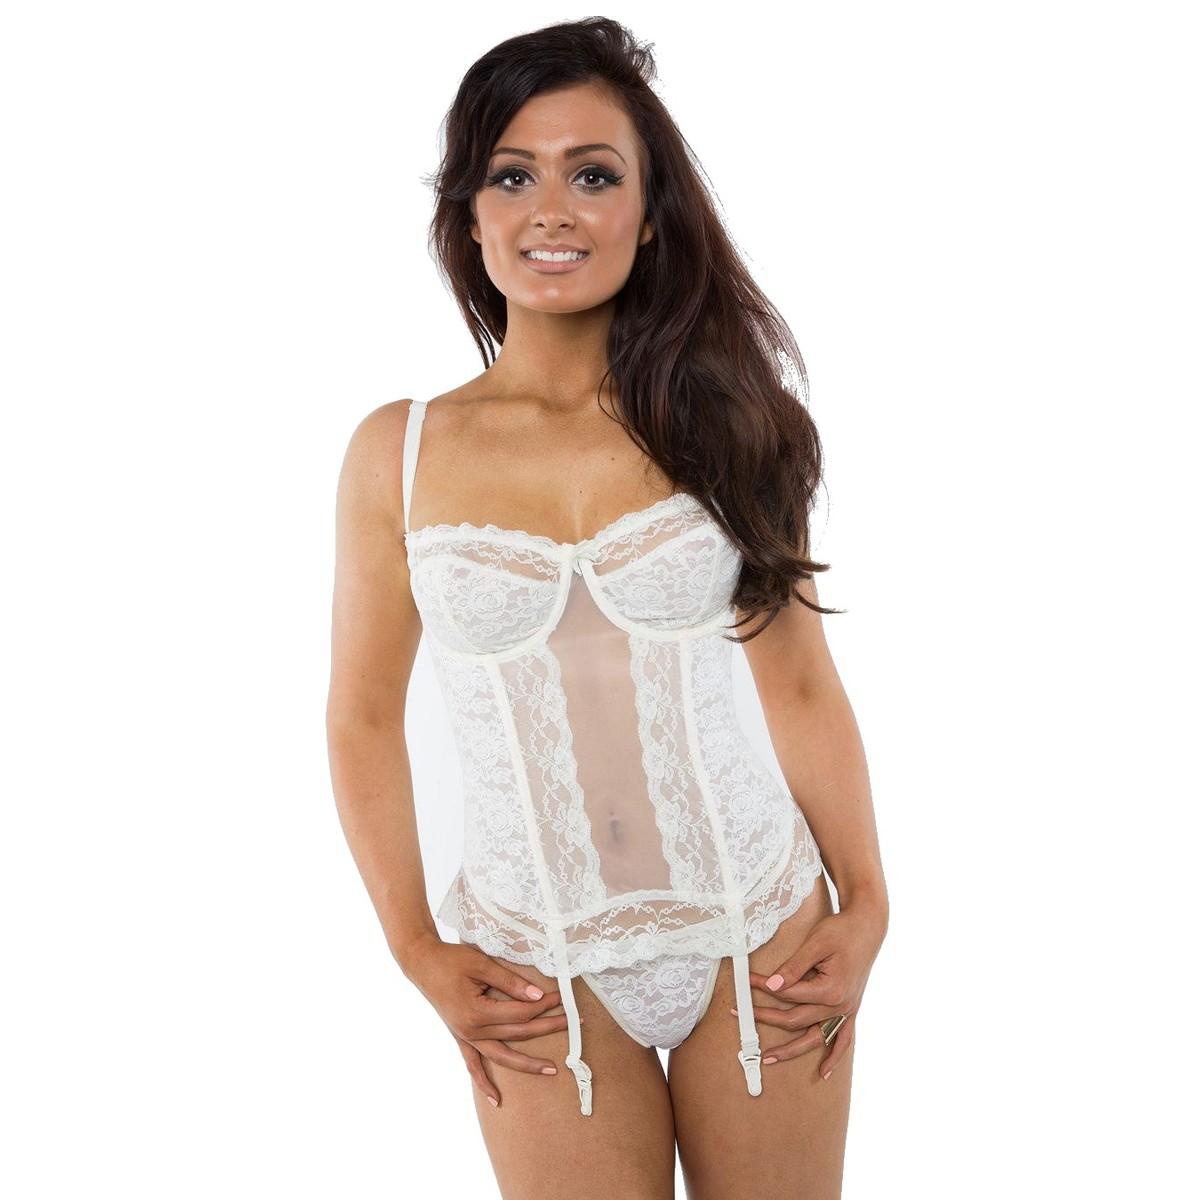 Gemm Lace Style Basque - White